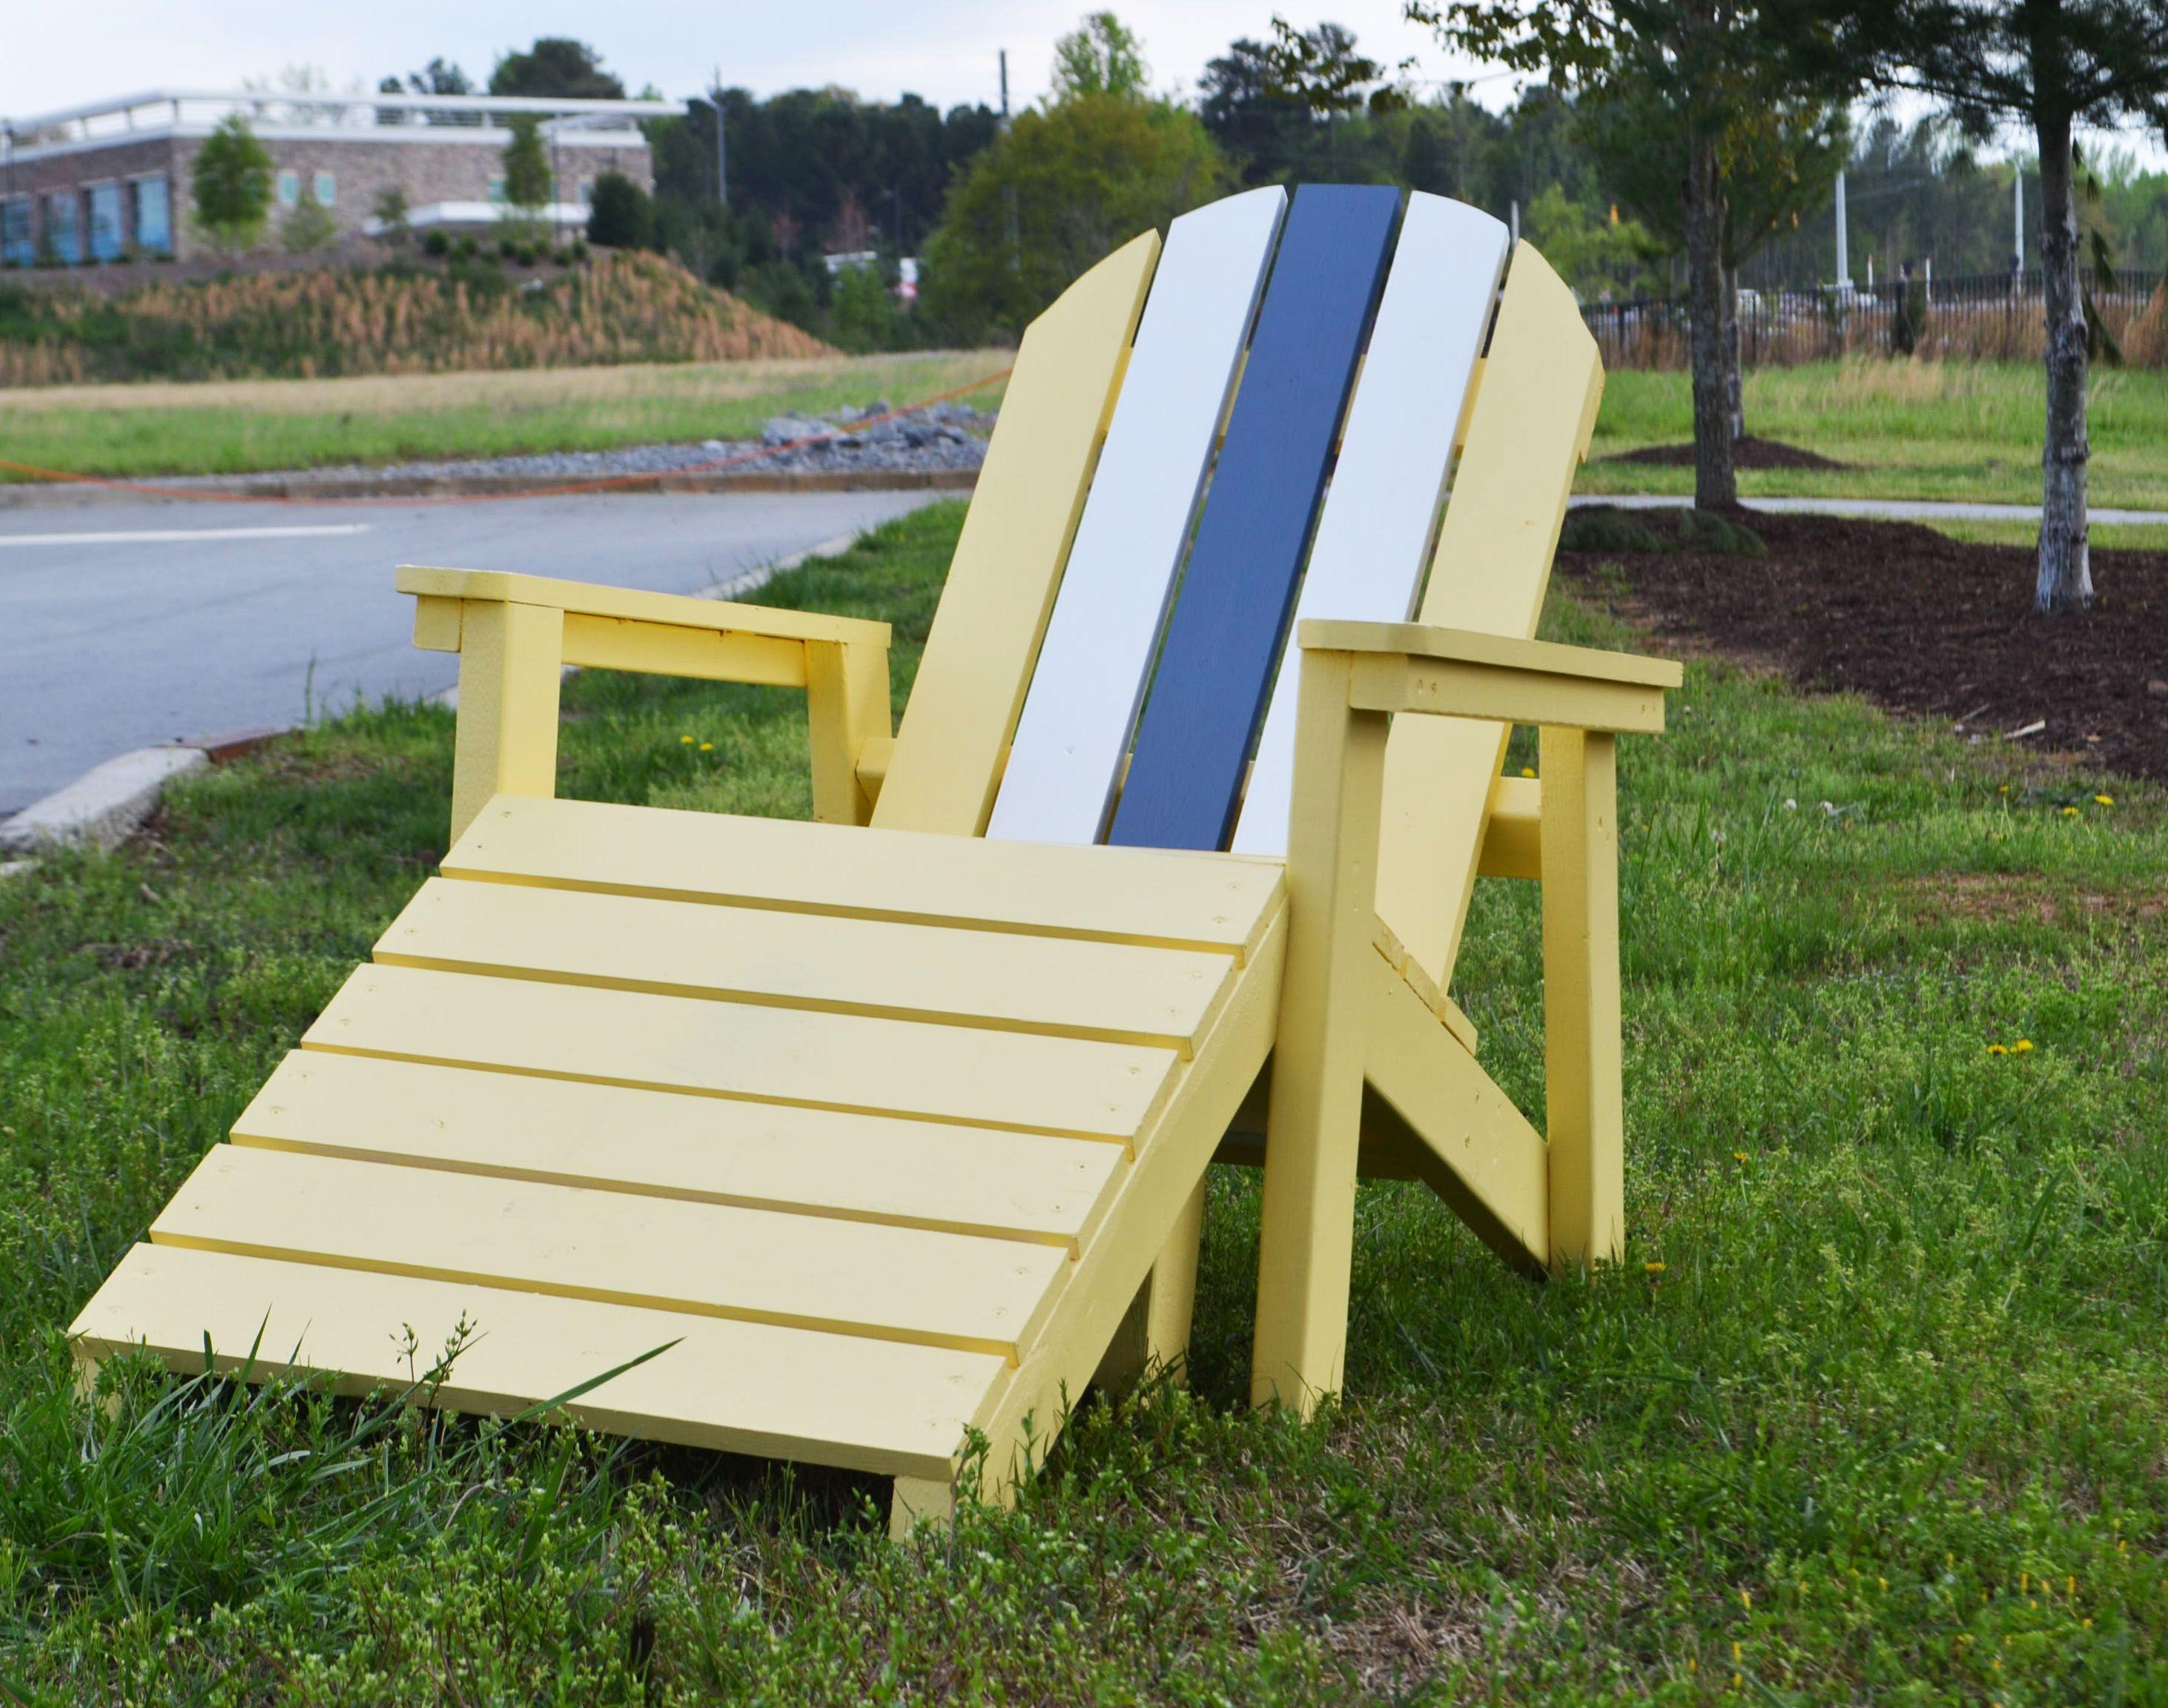 Home Depot Adirondack Footstool Diy furniture plans